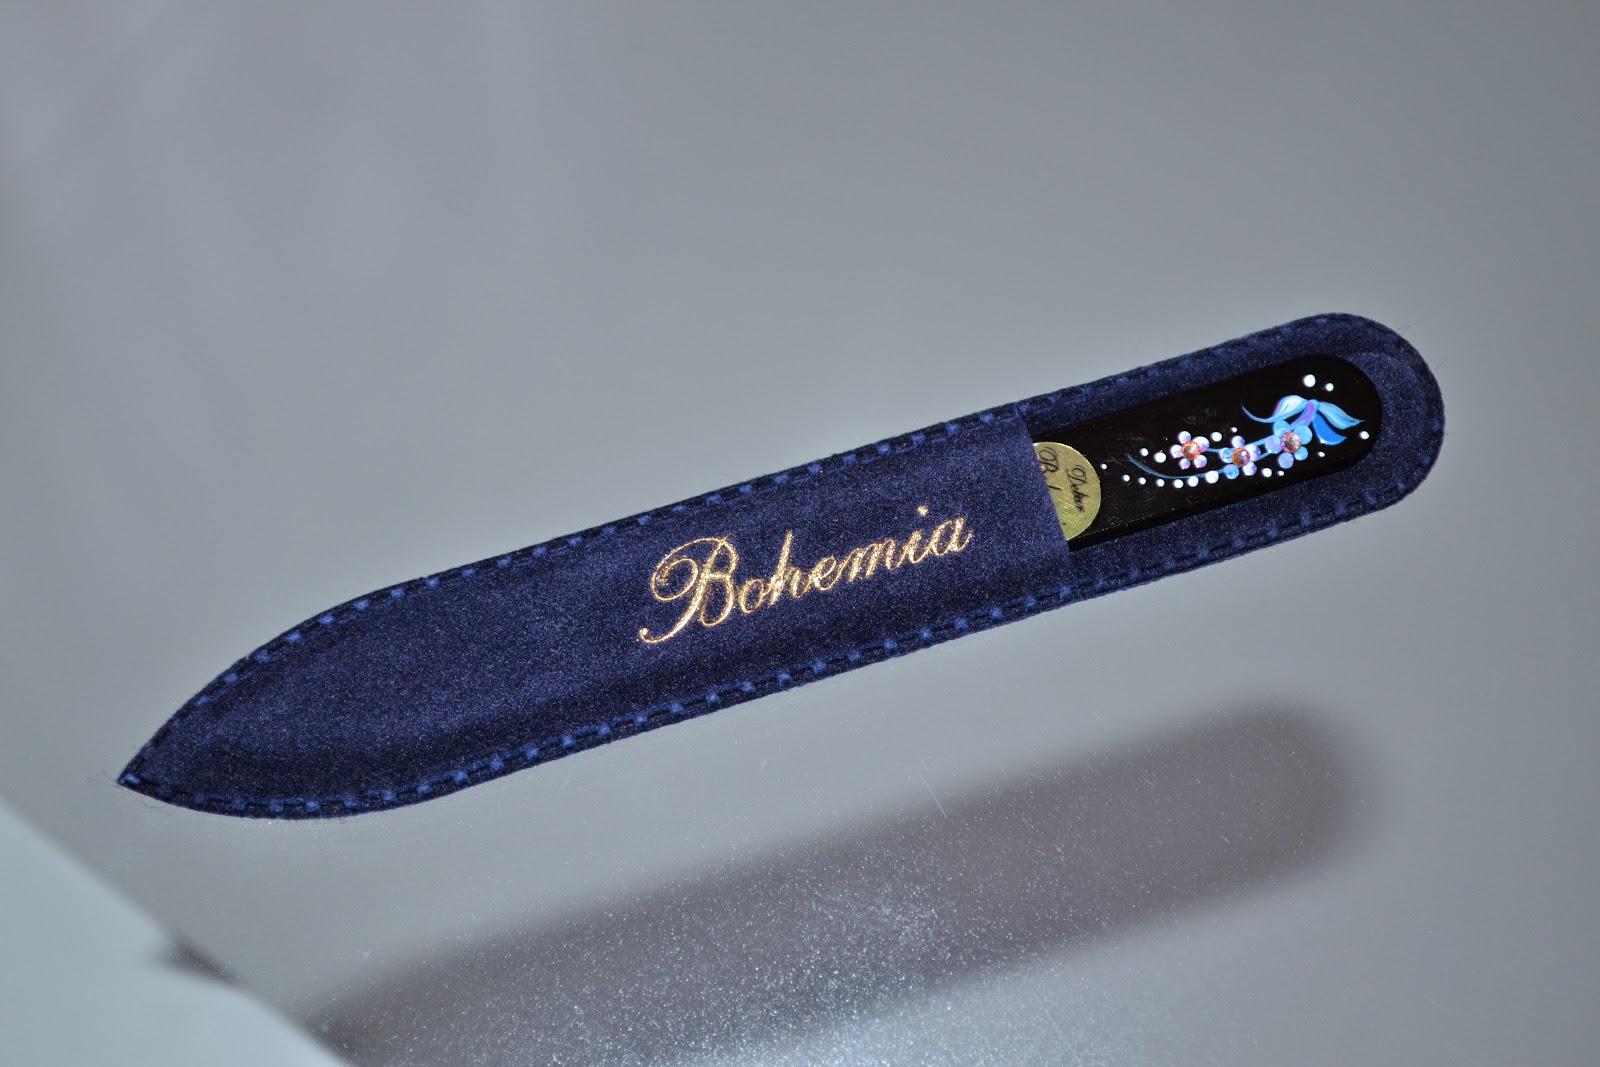 Пилка стеклянная для ногтей bohemia